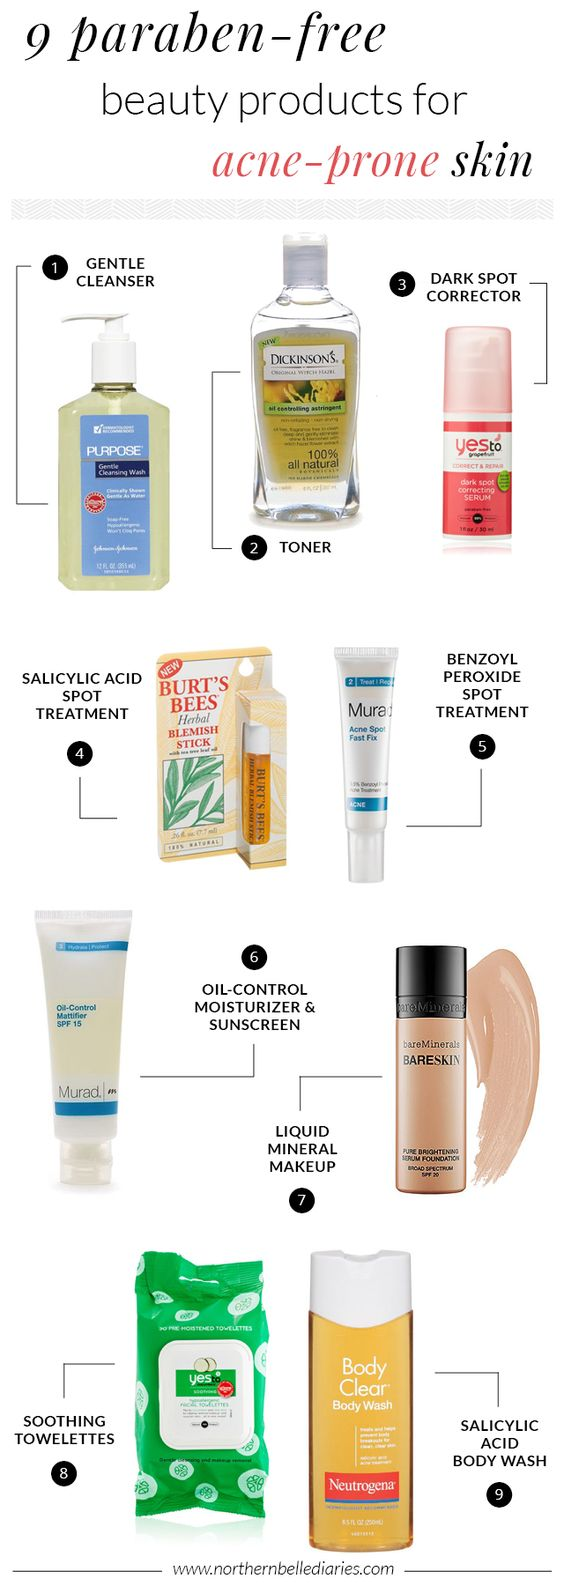 7 Skincare Tips For Acne-Prone Skin